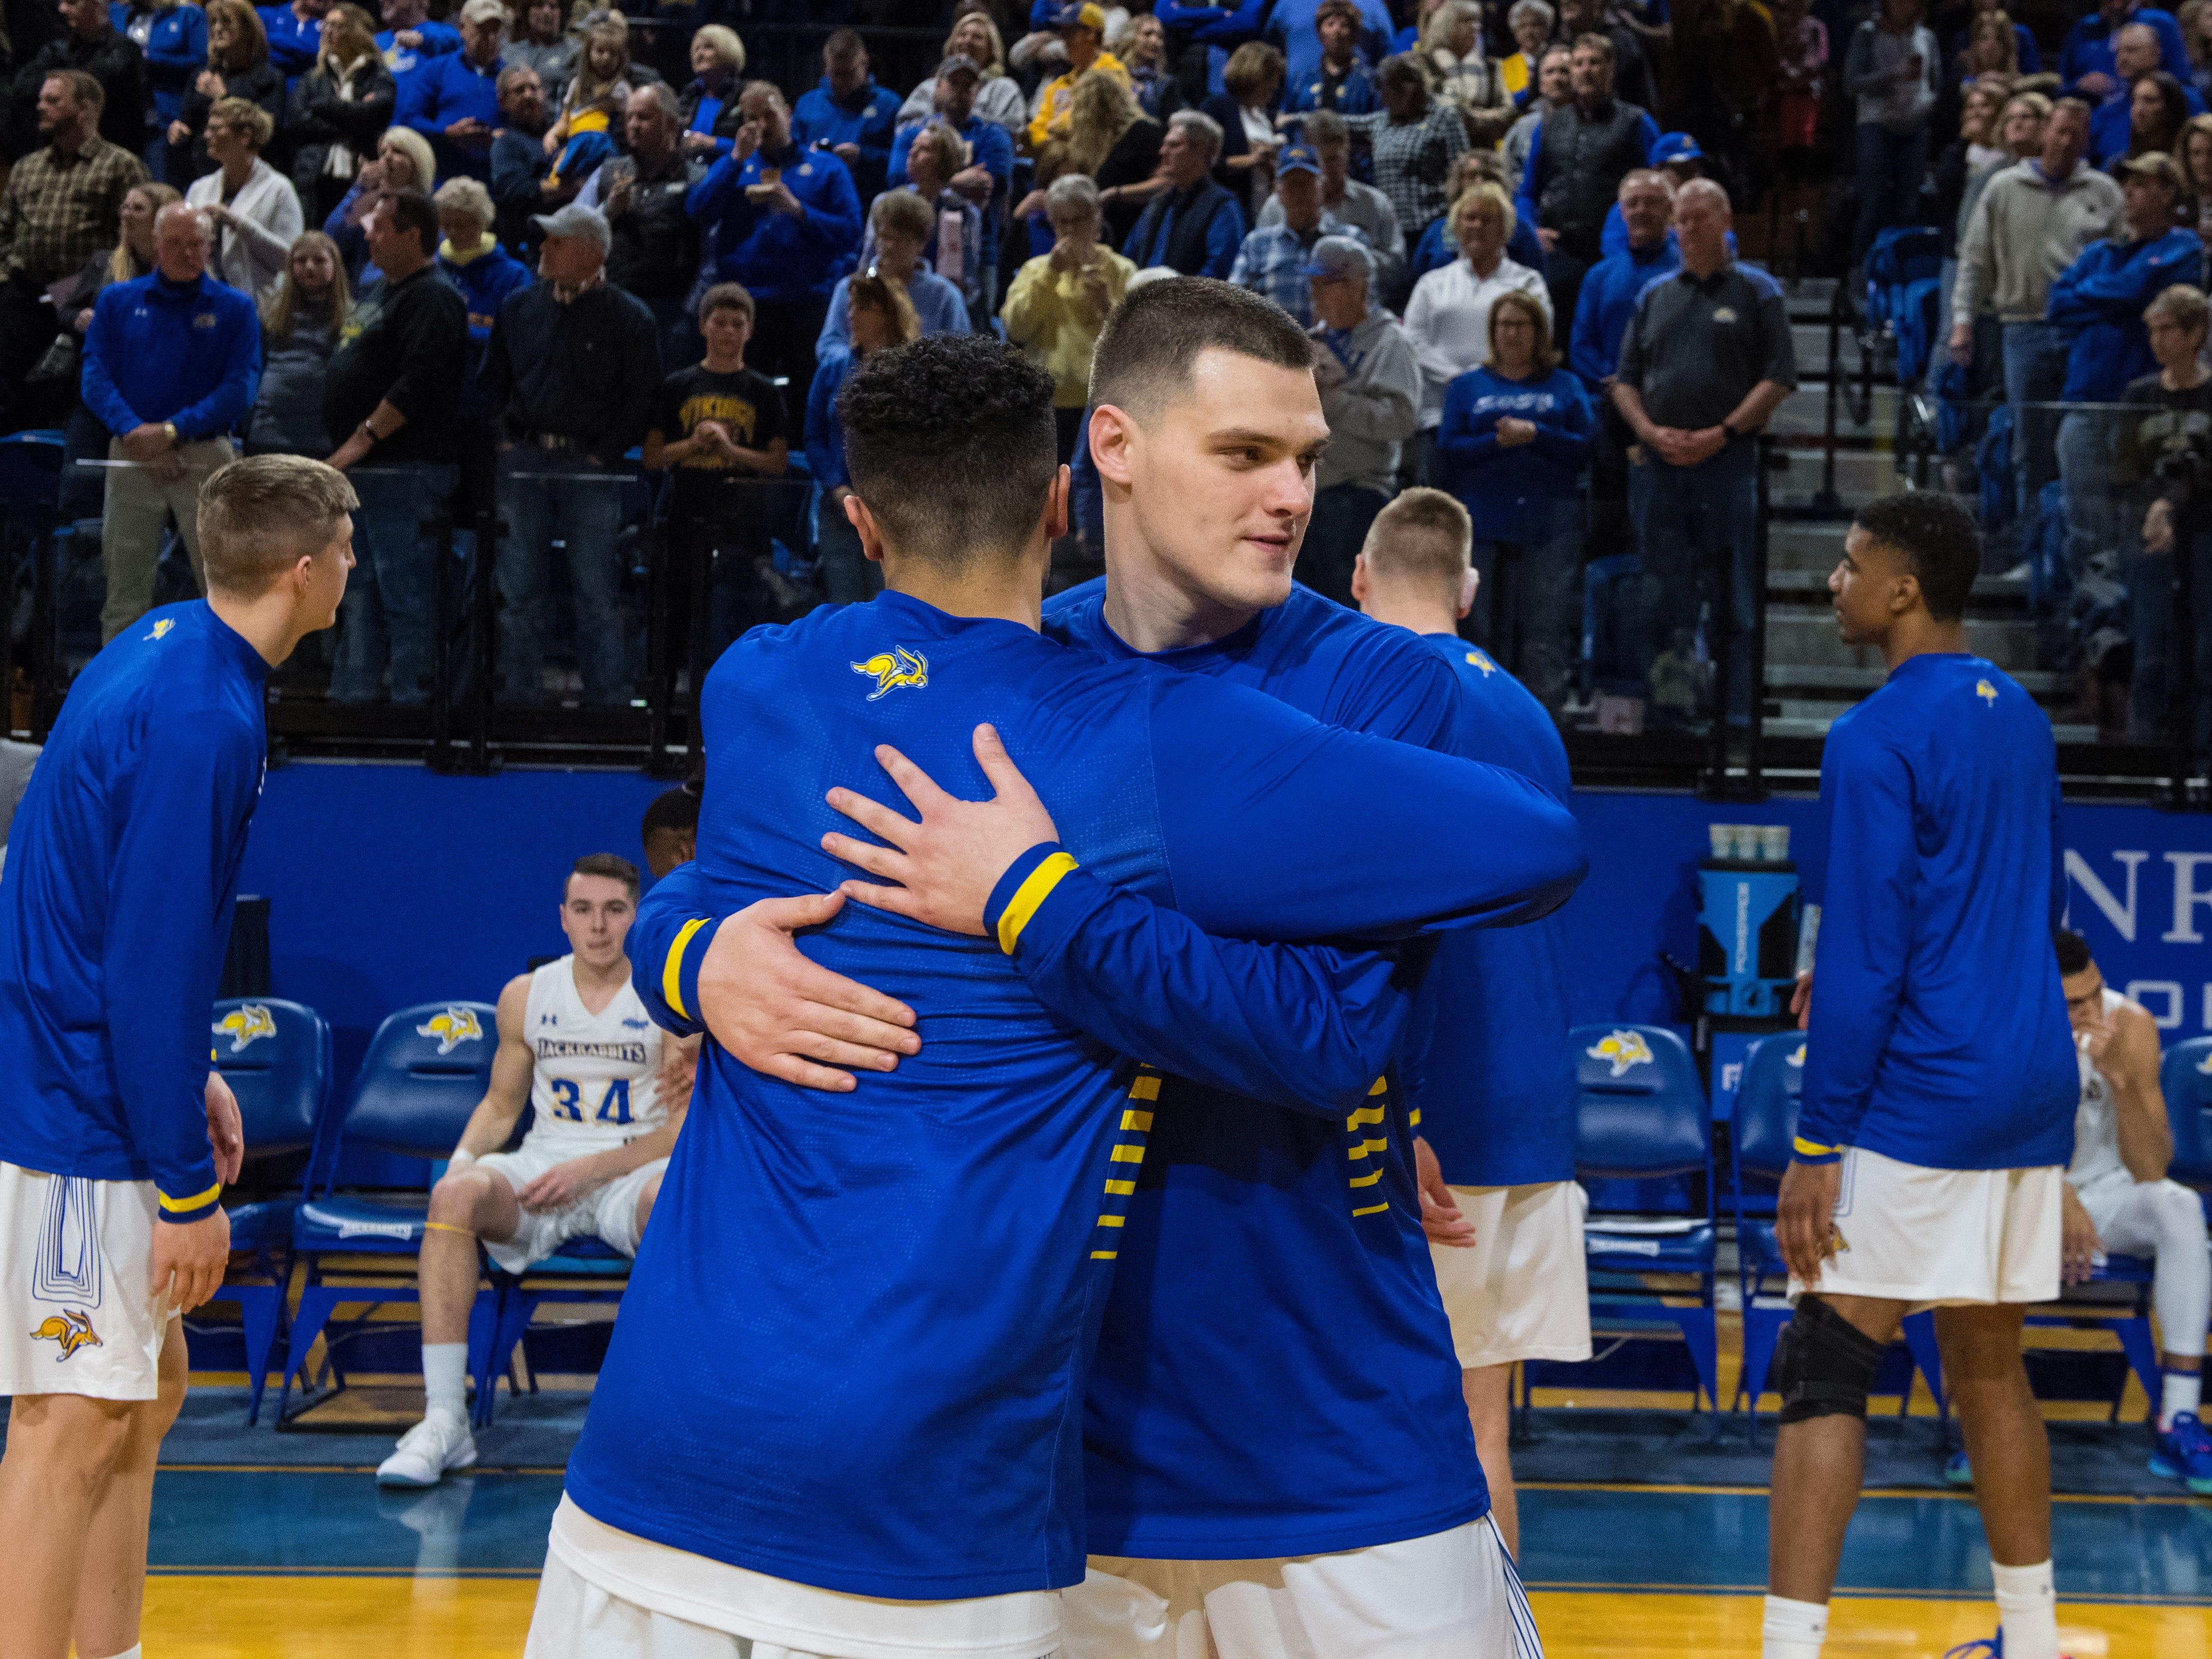 South Dakota State players hug before the game against North Dakota in Brookings, S.D., Saturday, Feb. 9, 2019.